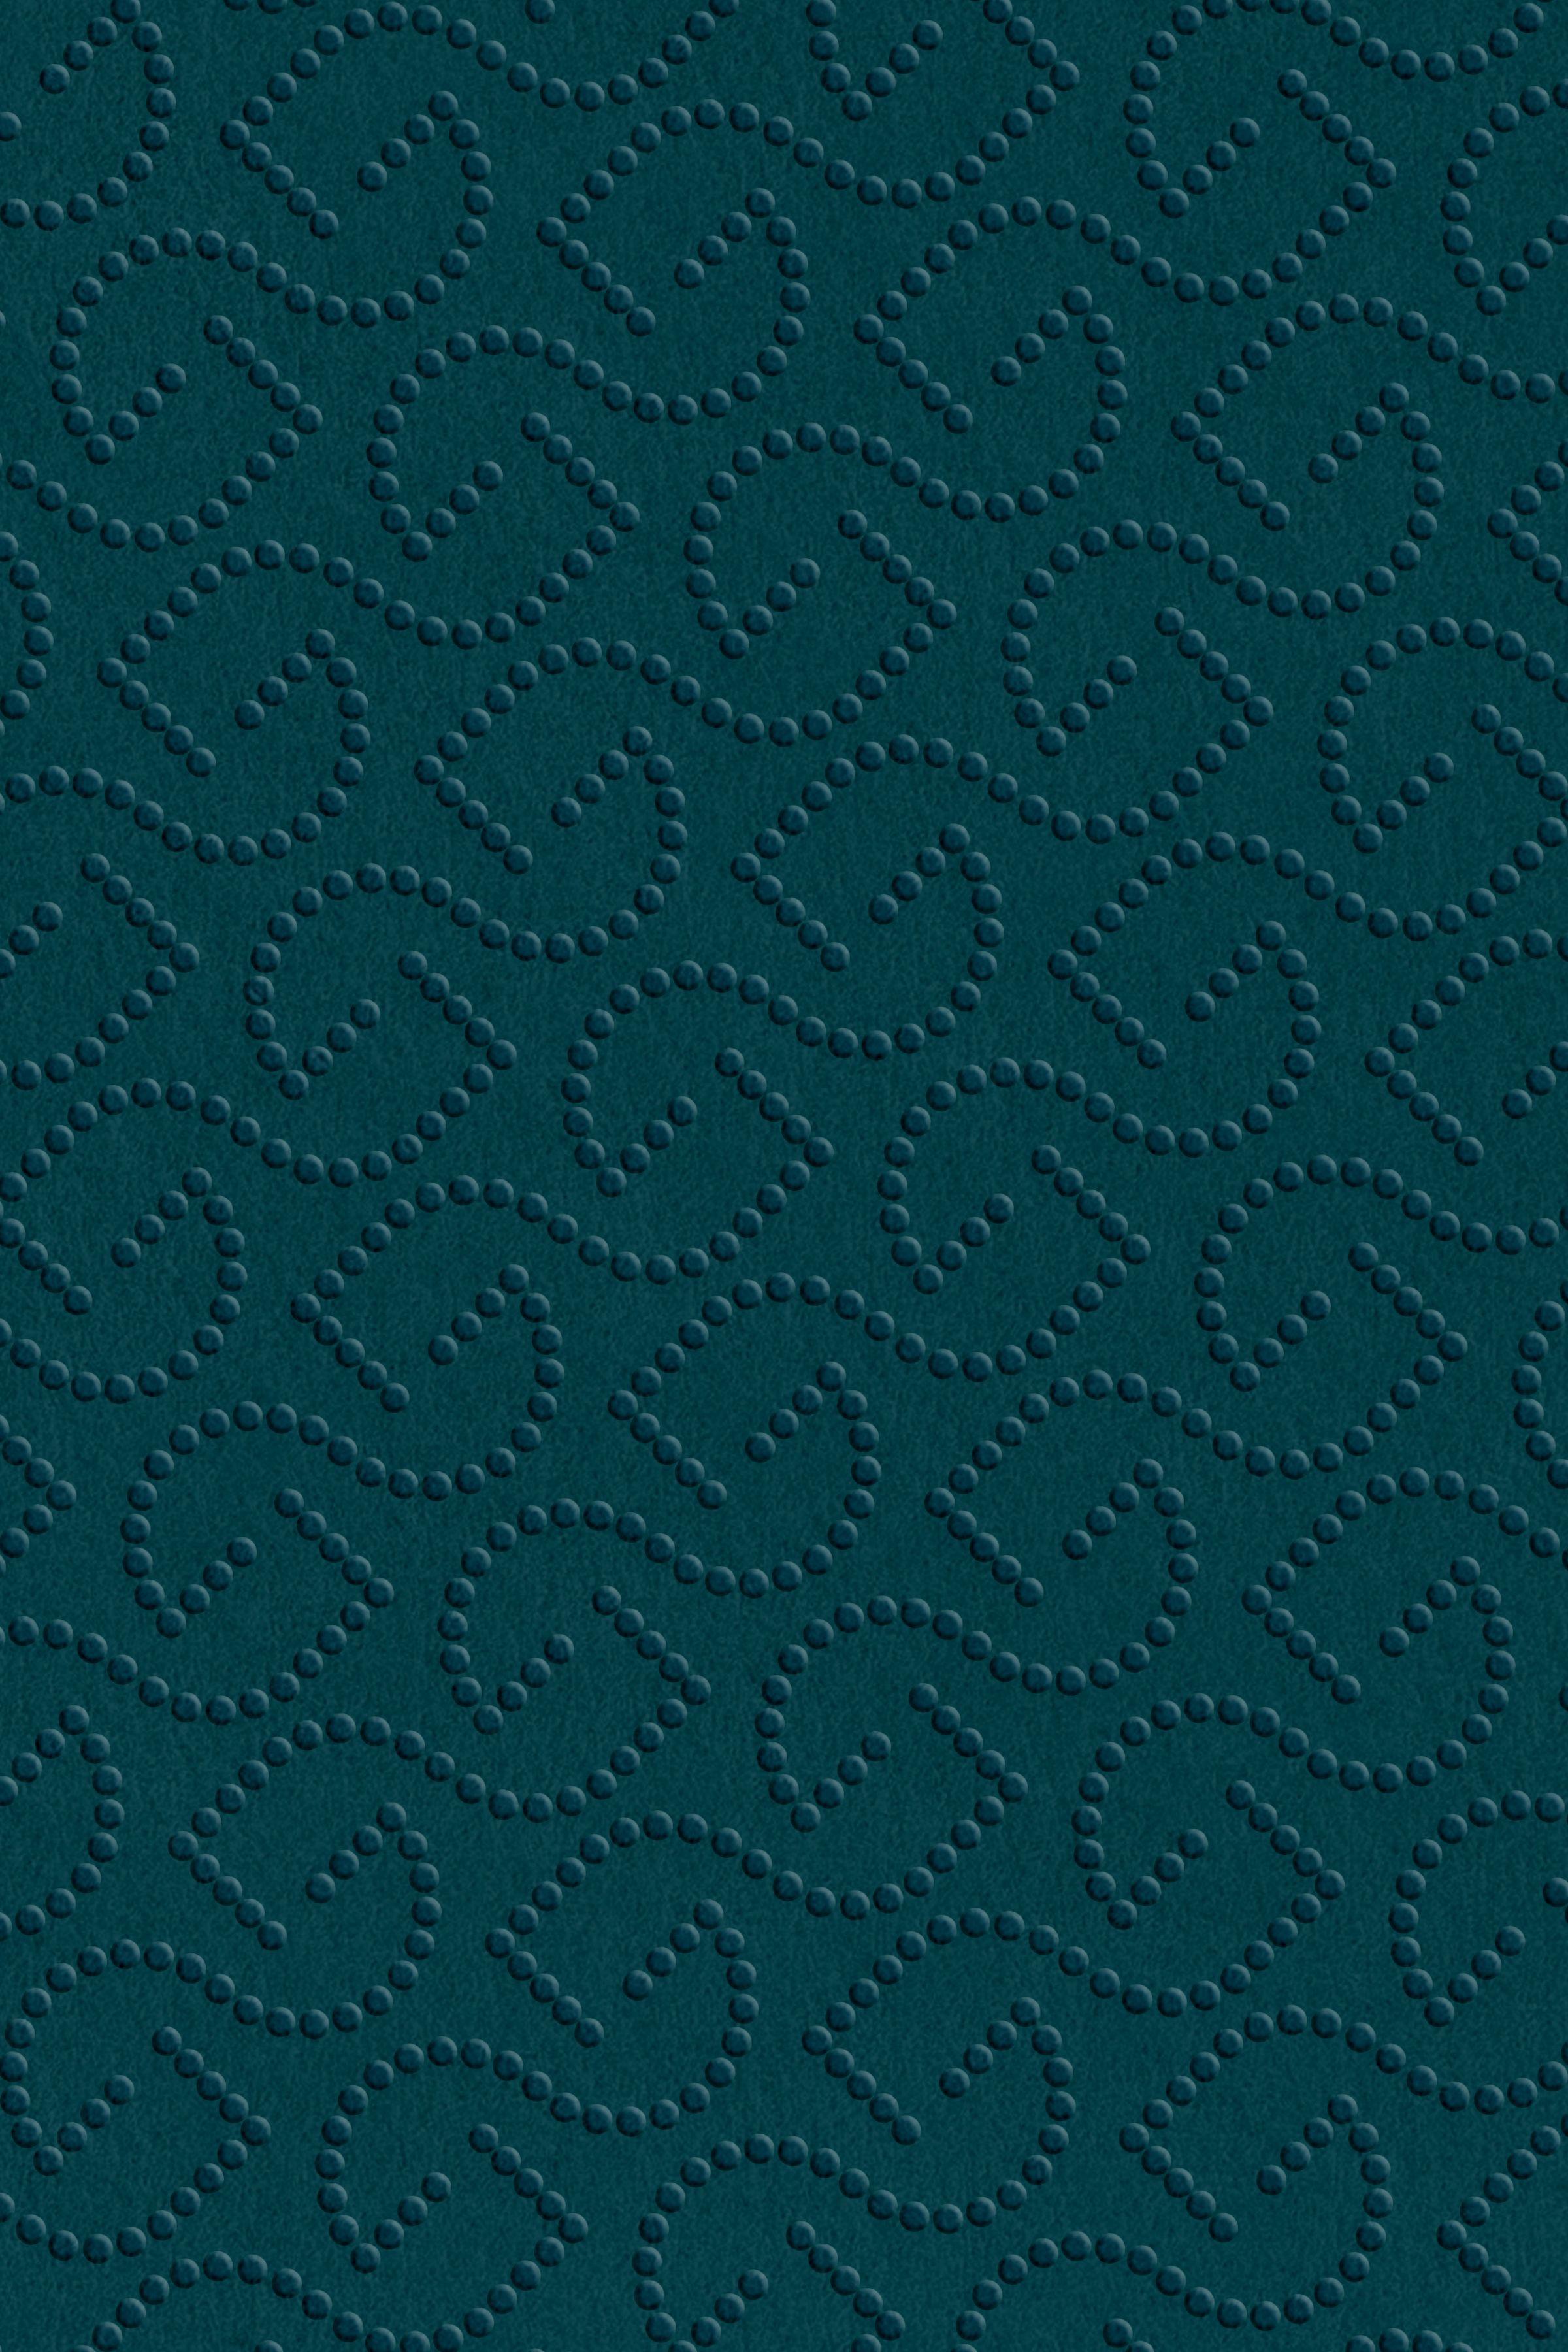 Georg Jensen makers mark pattern embossed in paper